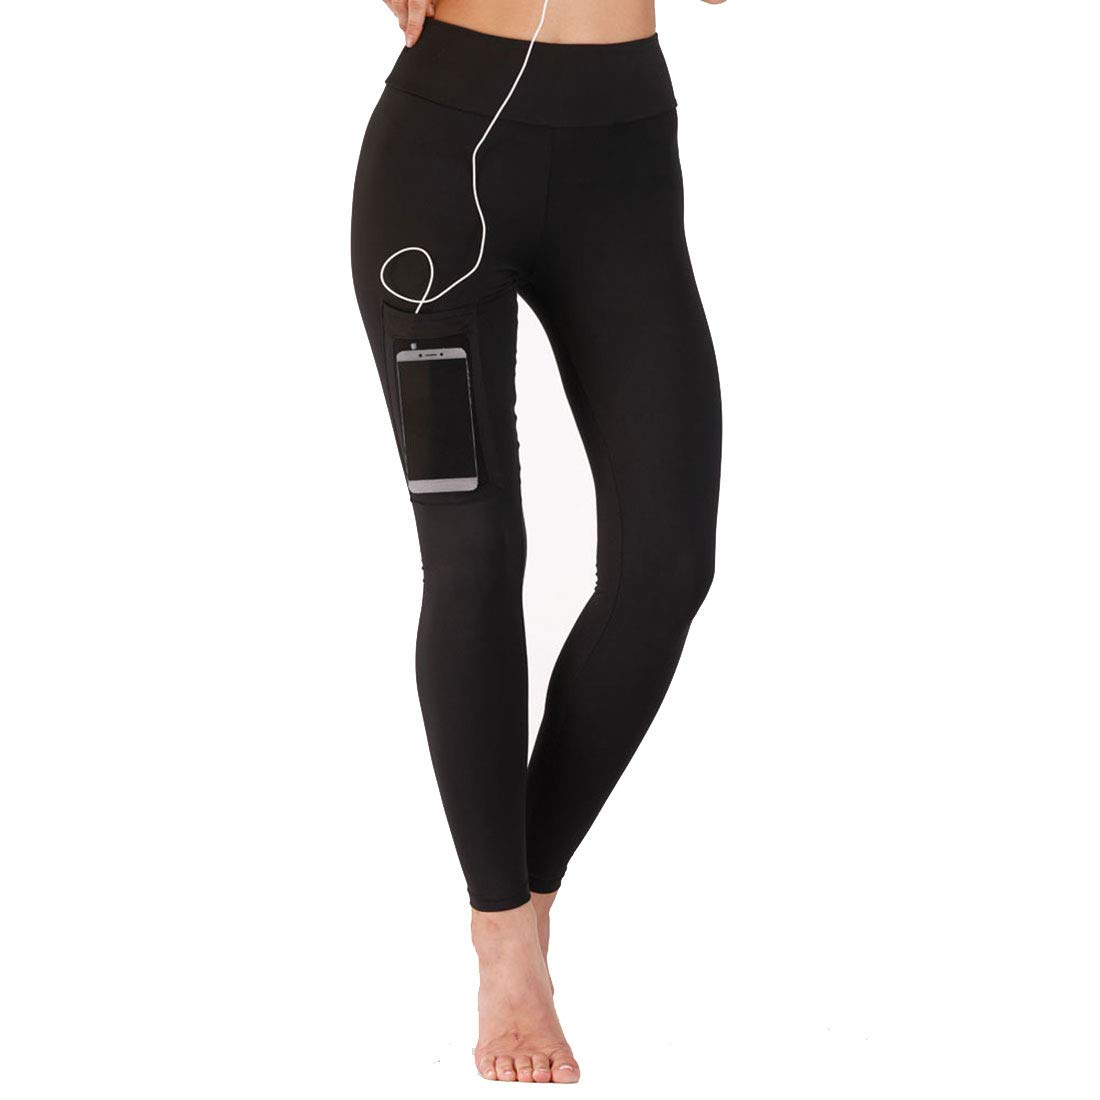 Huayue Yoga Pants Pocket Skinny QuickDrying Fitness Pants for Base Women